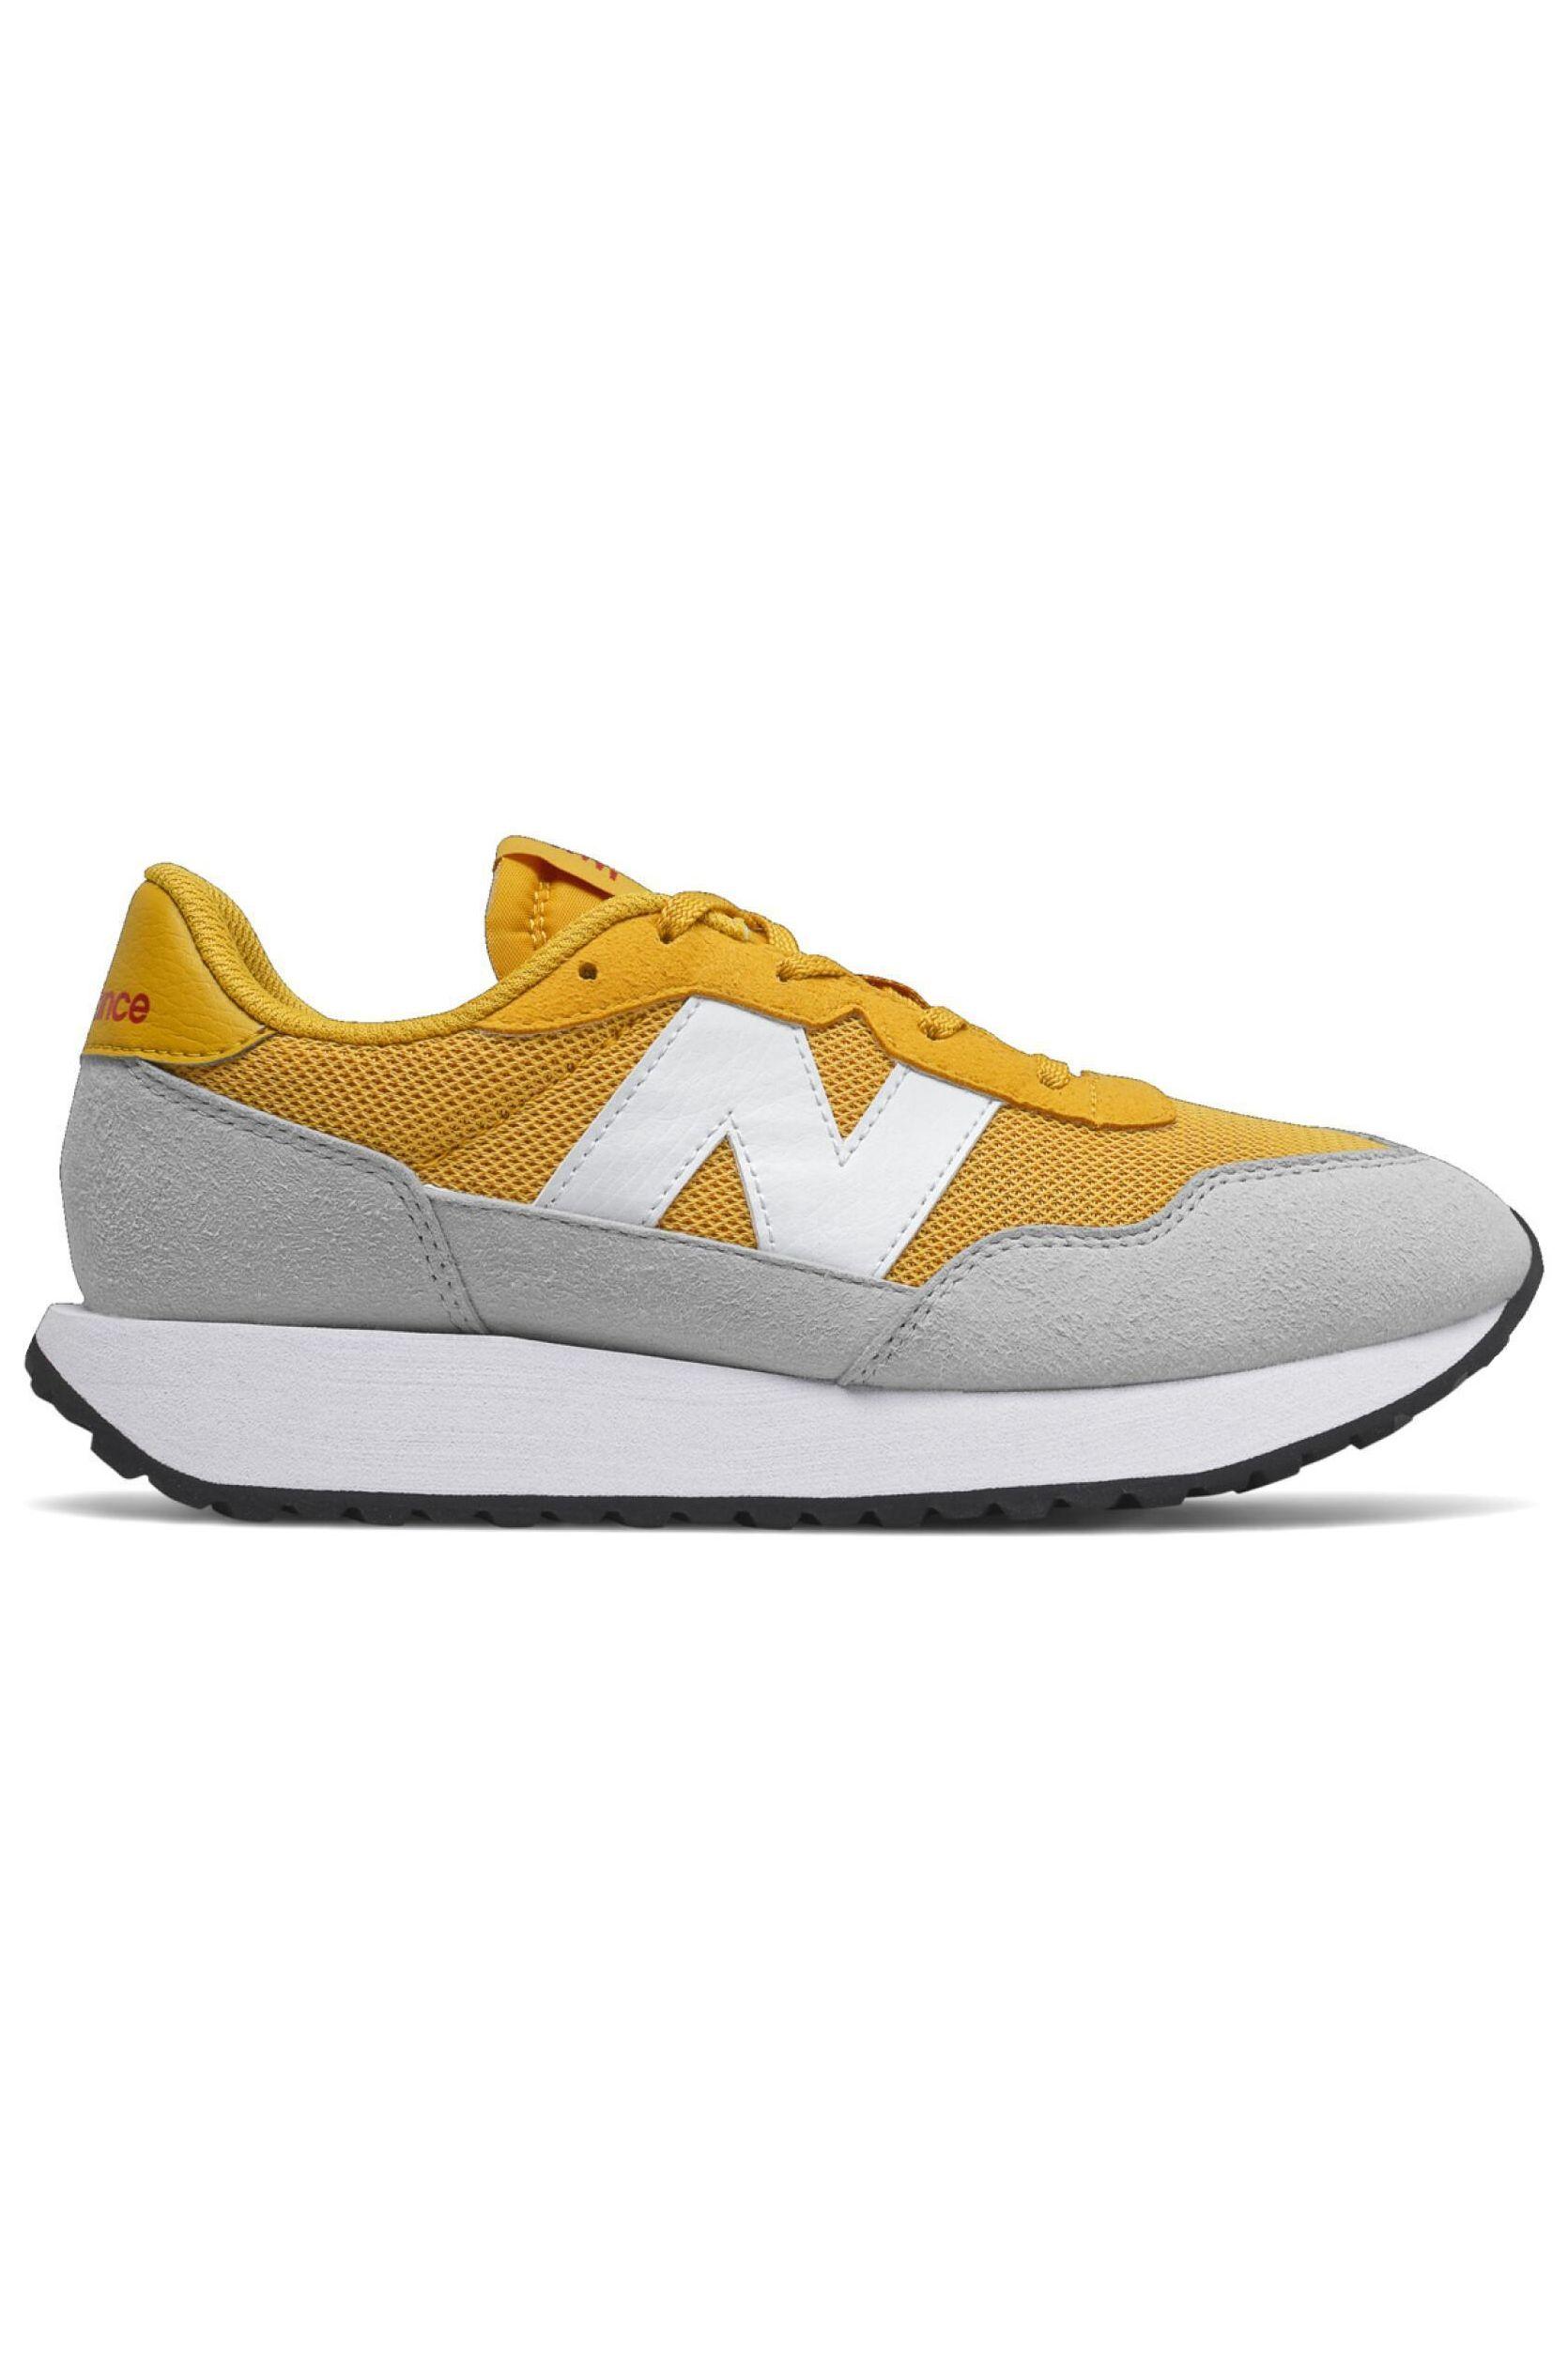 New Balance Shoes GS237HG1 Harvest Gold